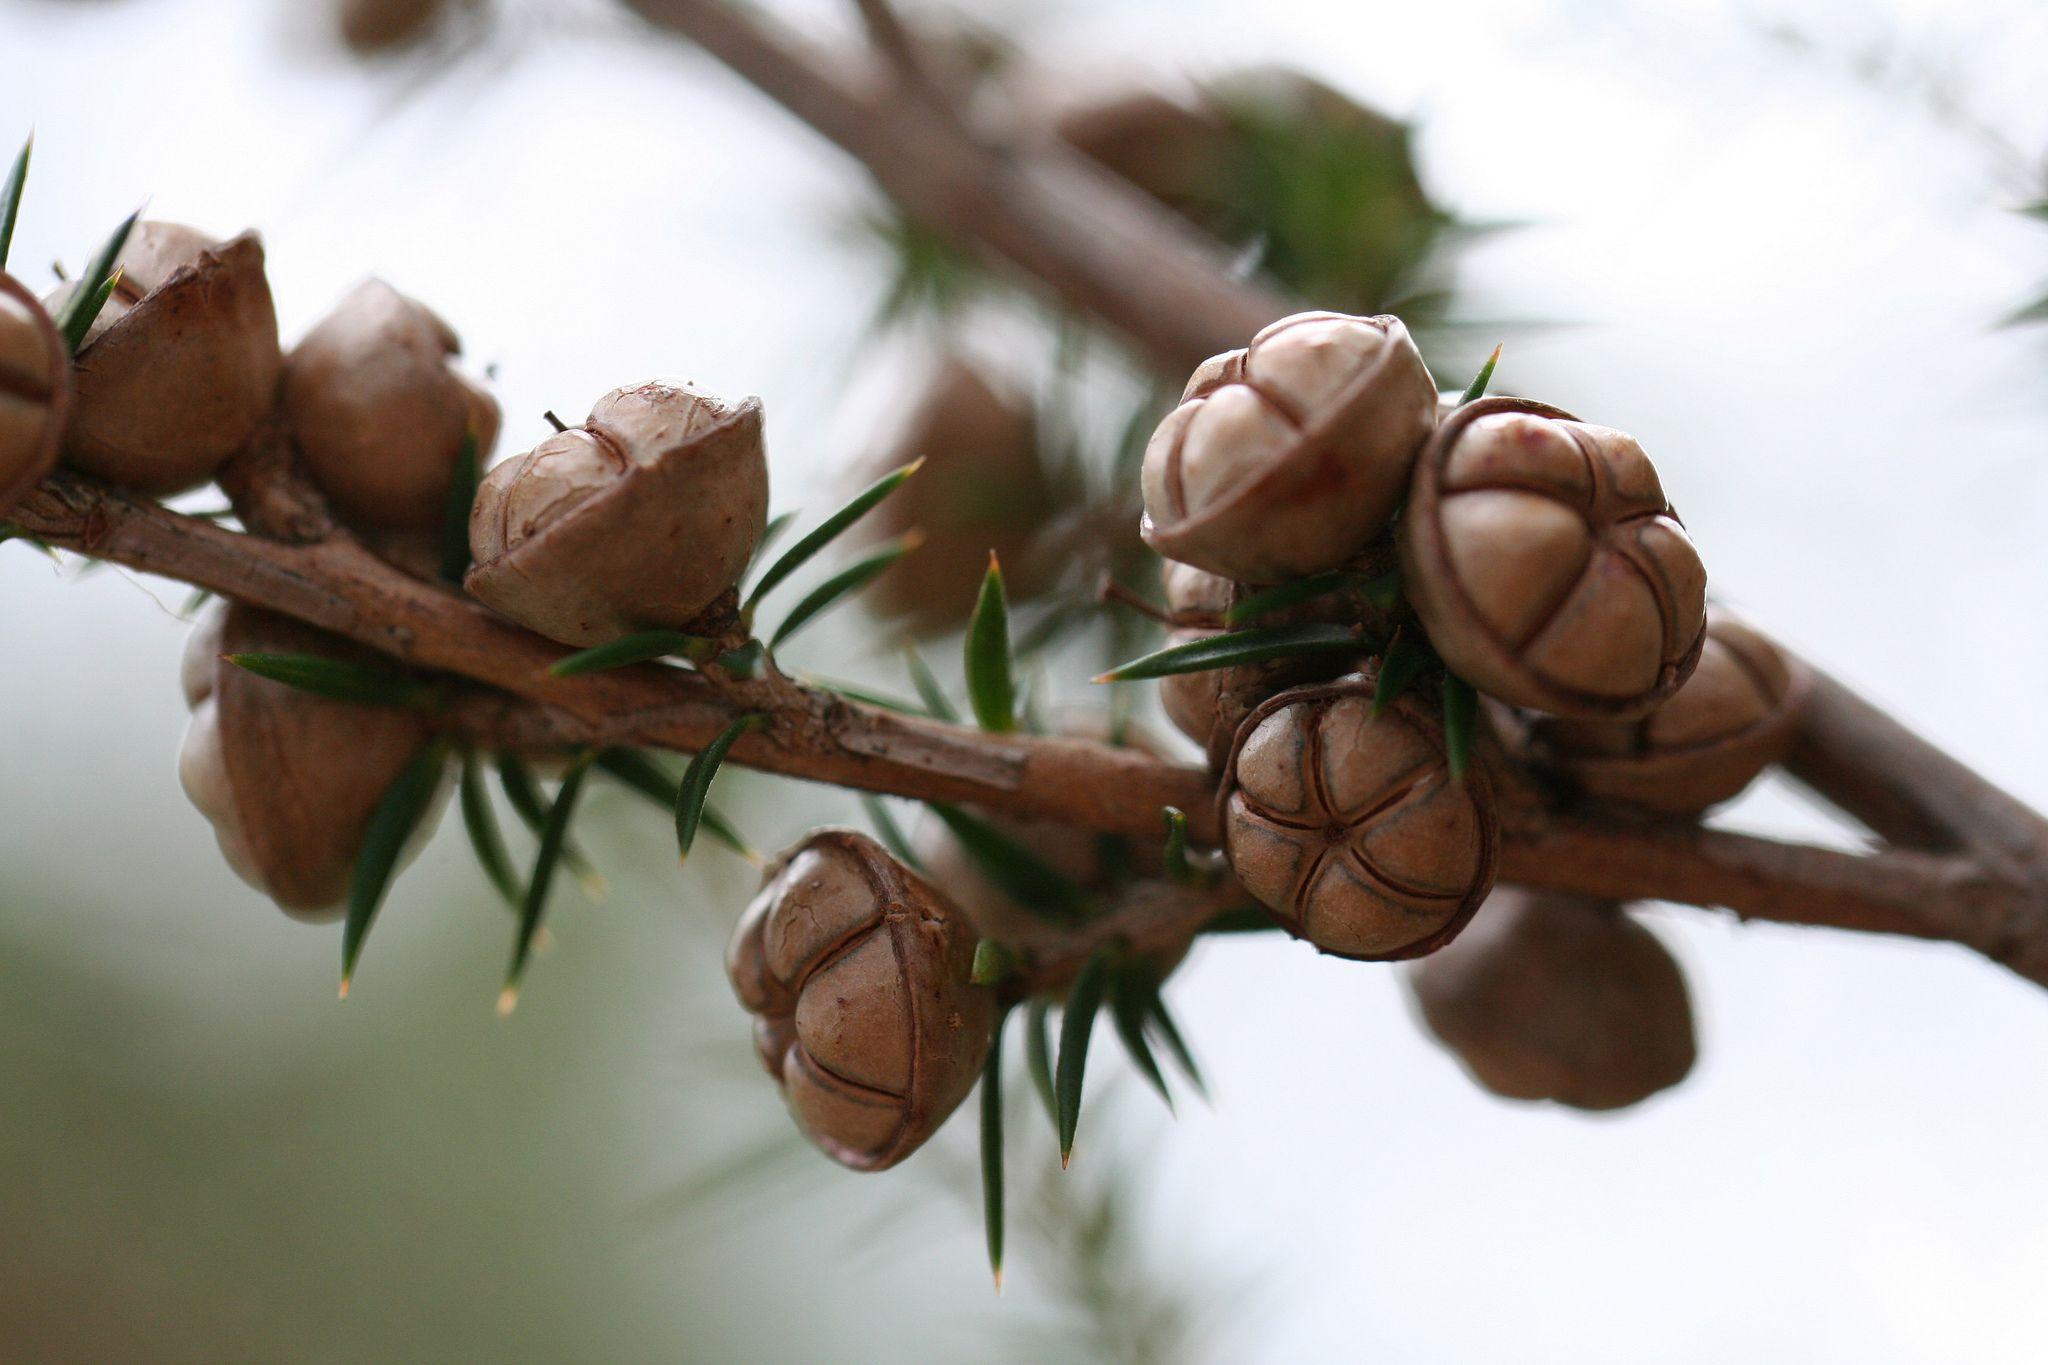 20120401 4004 Tea Tree Seed Pods Tree Seeds Seed Pods Seeds